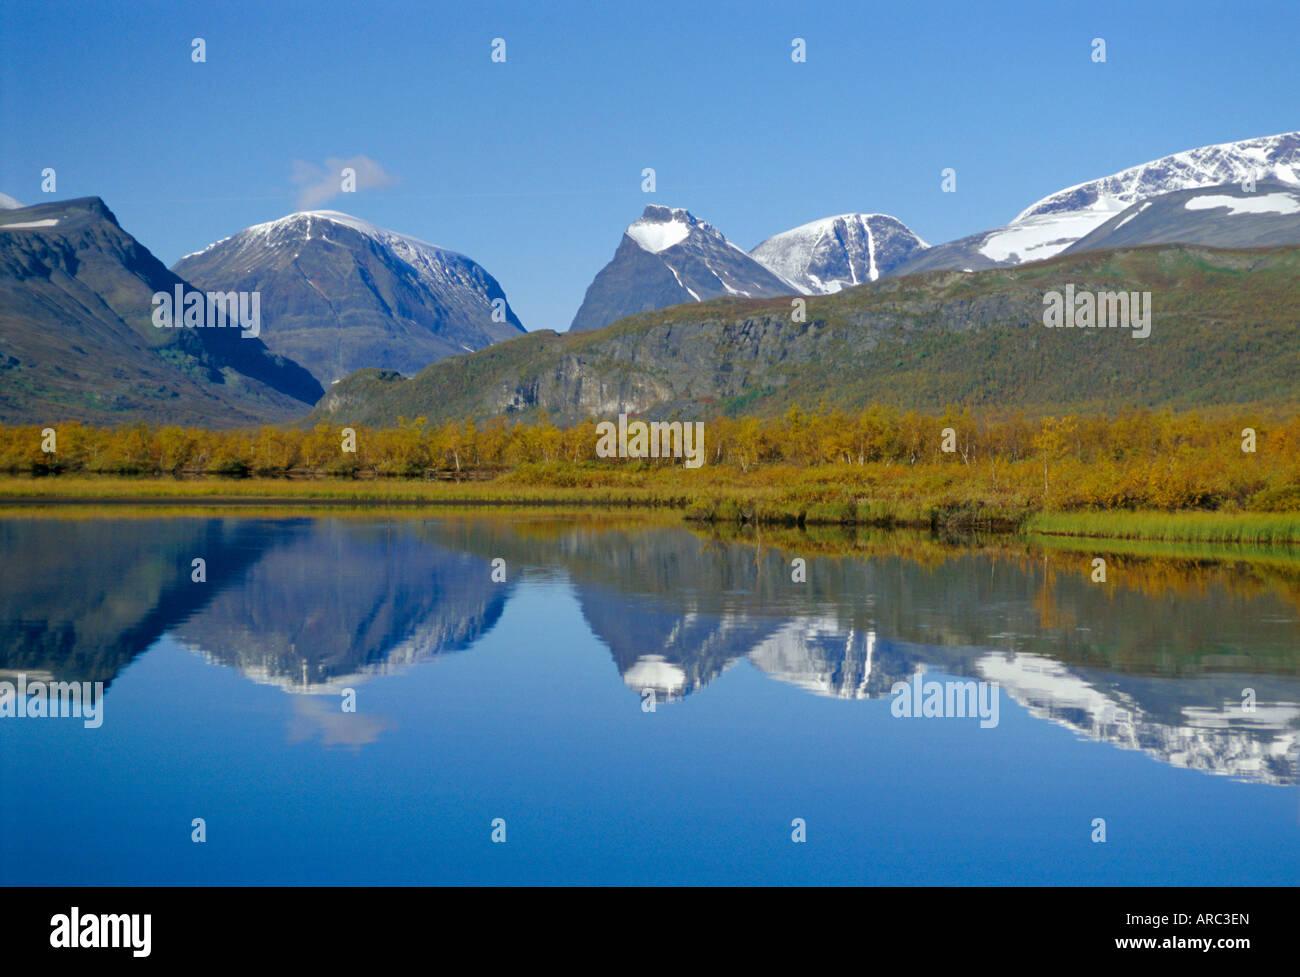 Mt. Kebnekaise, Sweden's highest mountain, (2117m), Laponia World Heritage Site, Lappland, Sweden, Scandinavia, - Stock Image